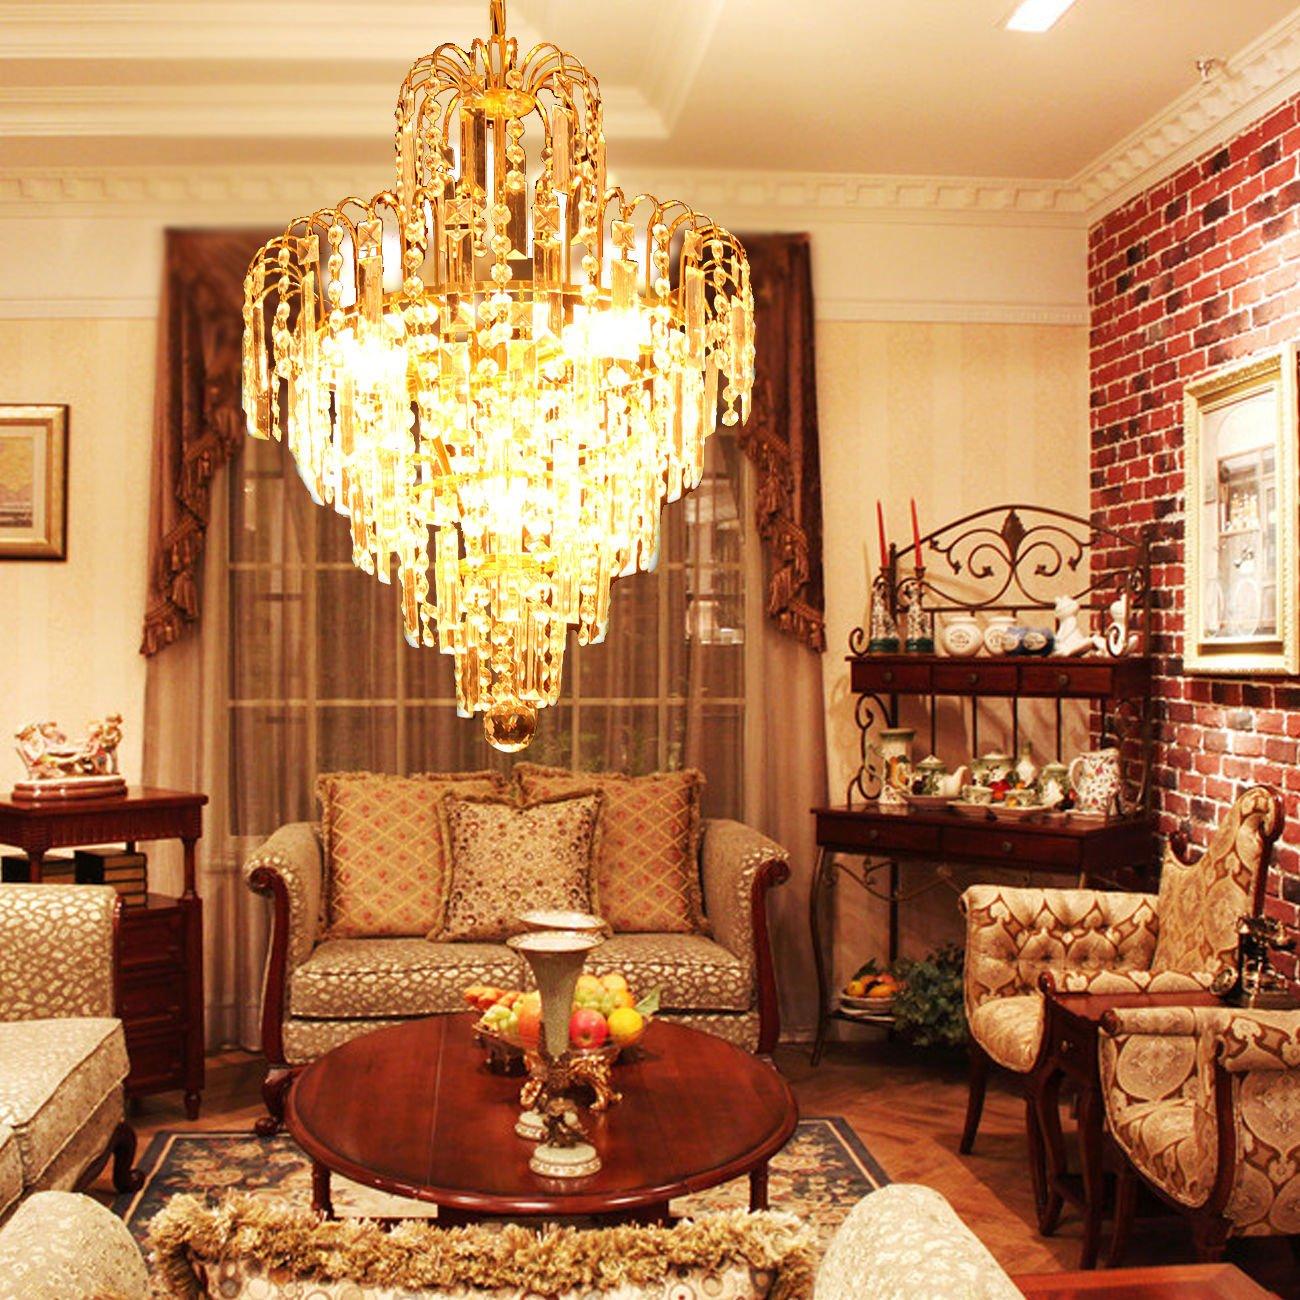 Ridgeyard E12 Luxury Chandelier Ceiling Pendant Light Modern Elegant Crystal Lamp Fixture lighting for Hotel Bedroom Living Room Boutique